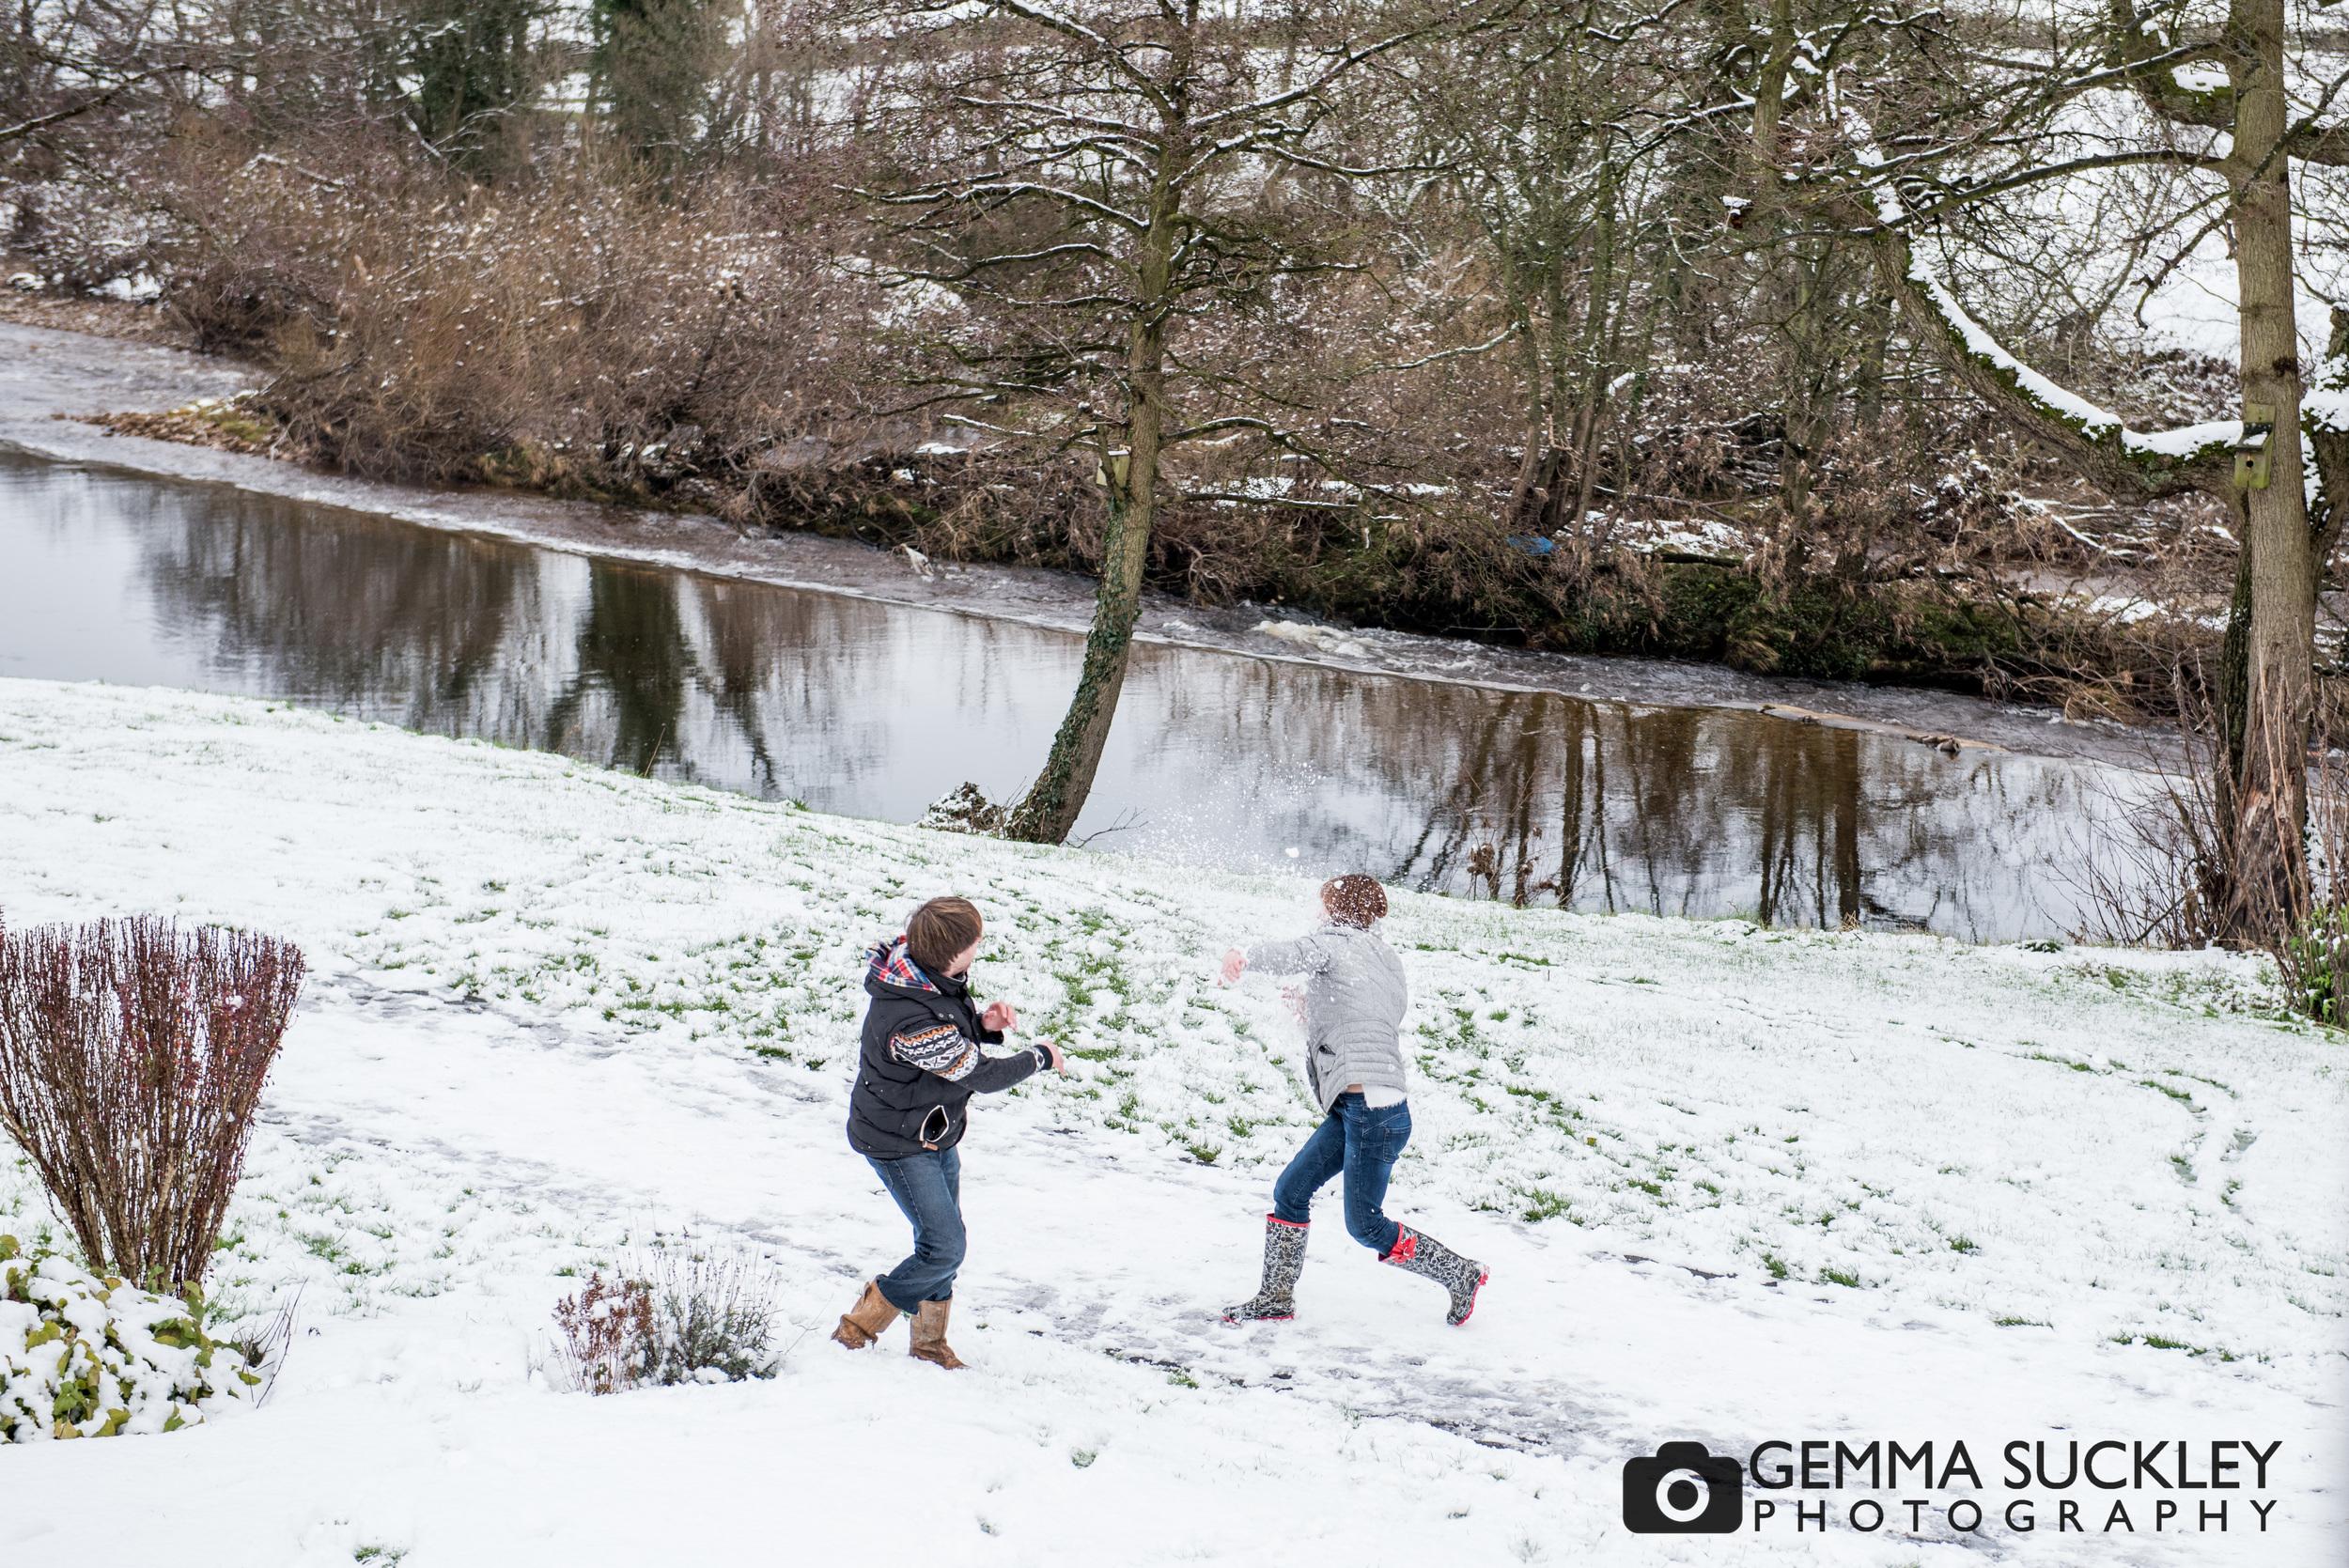 snowy-photo-shoot-addingham .JPG